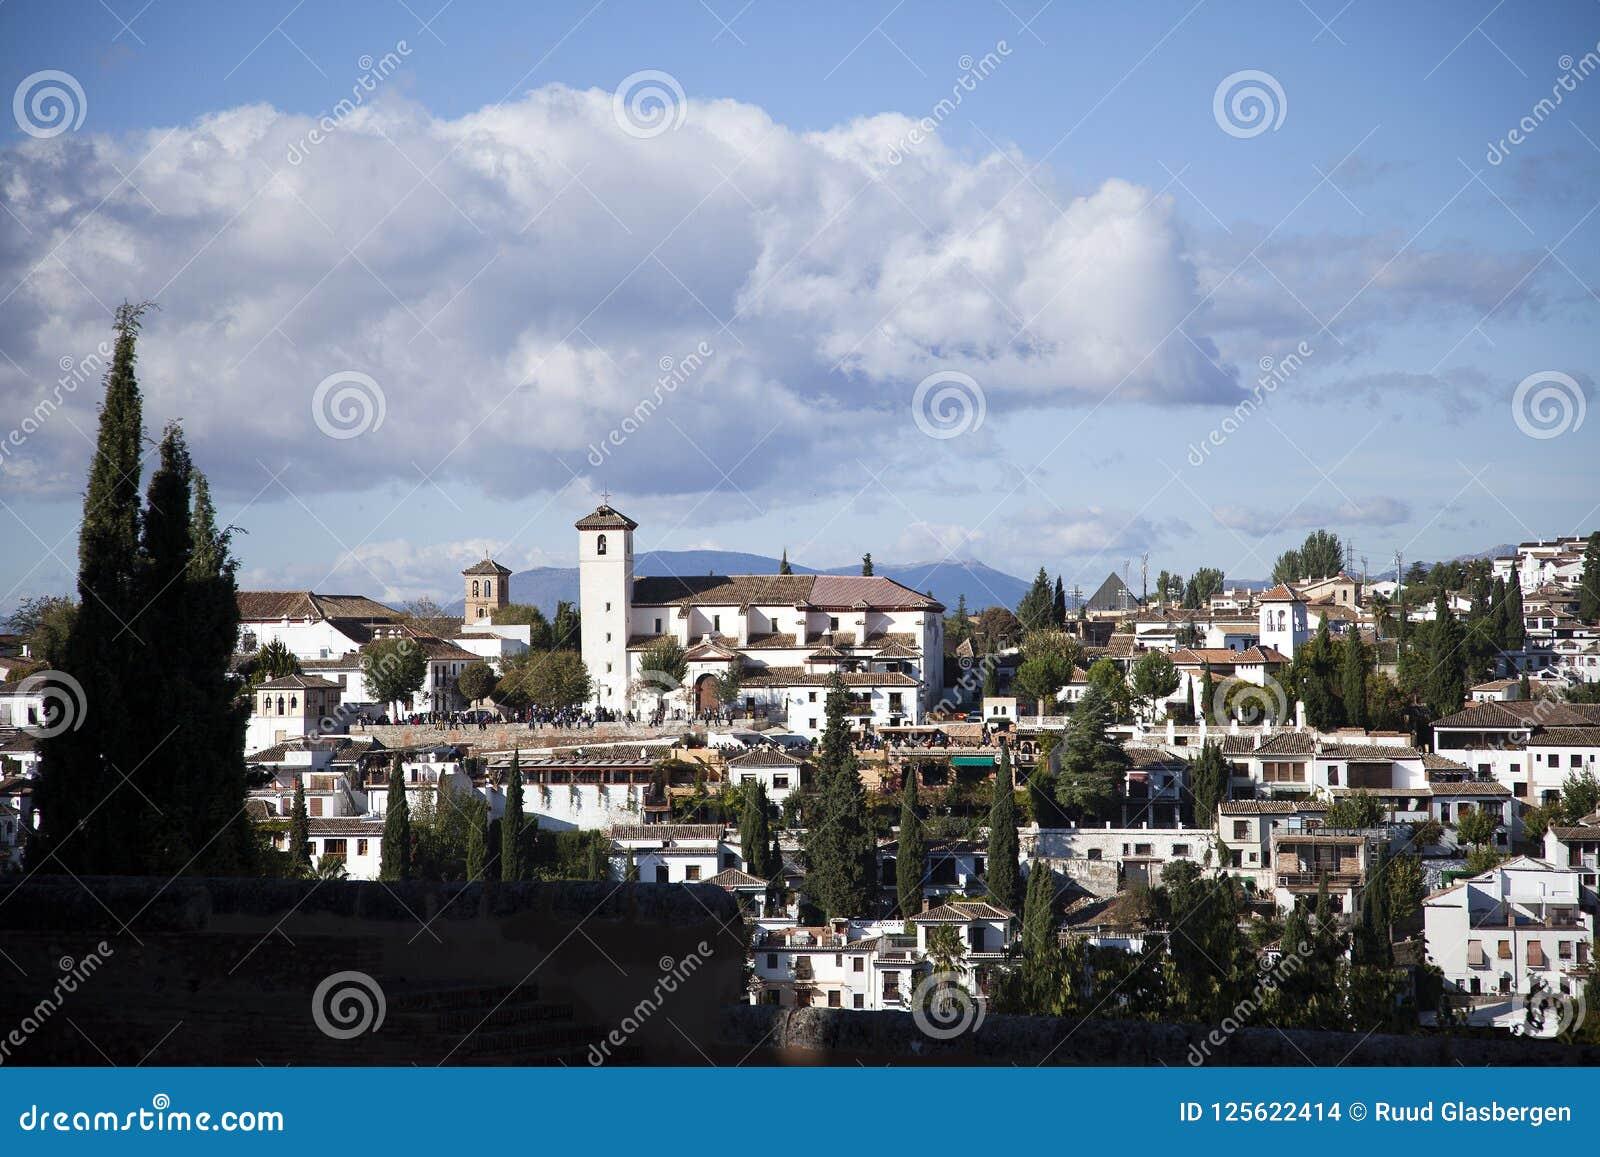 Albaicin, The Historic Moorish Quarter Of The City Of Granada Stock